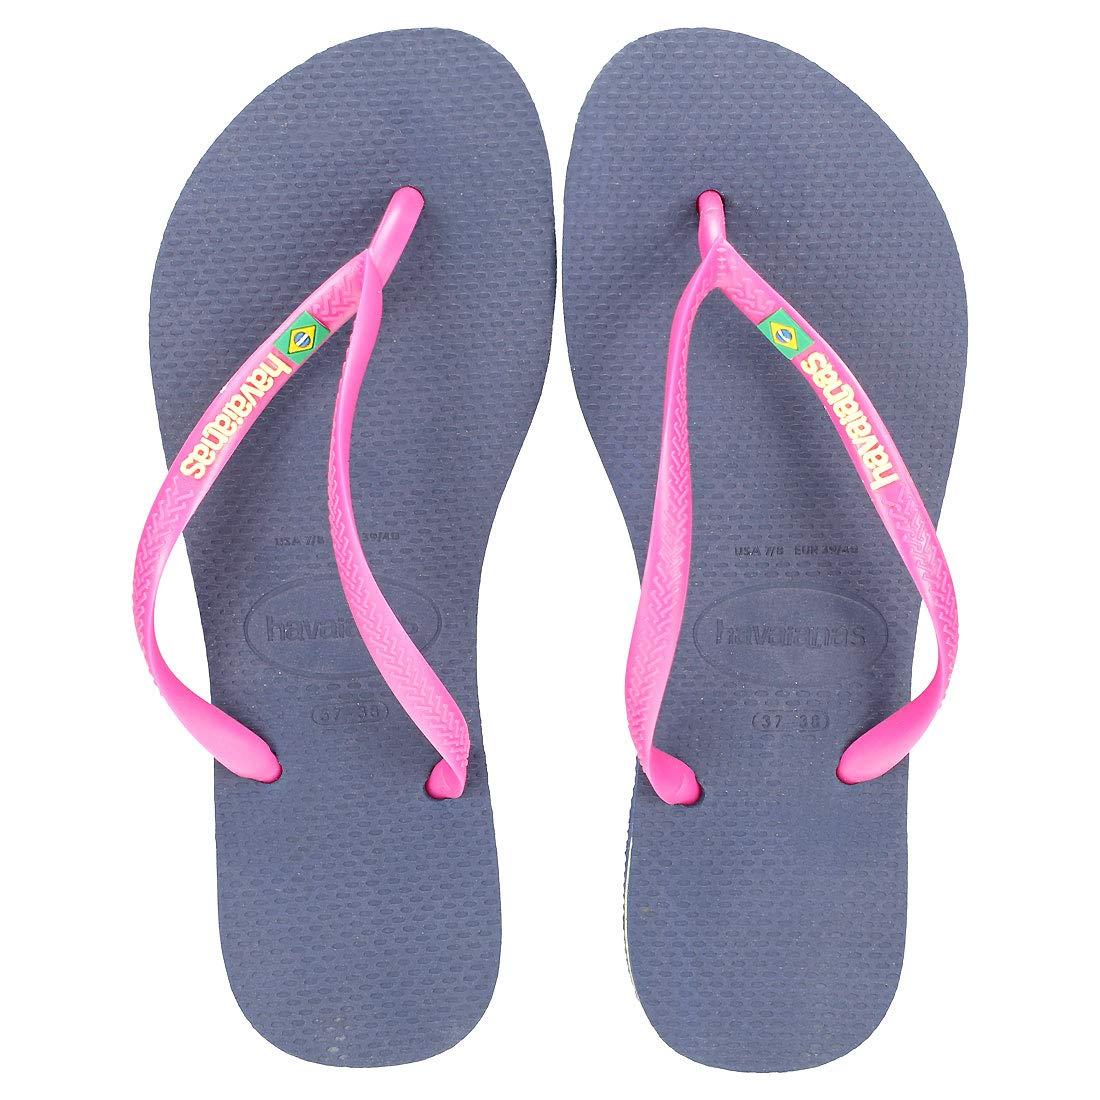 GENUINE Havaianas Brasil 2018 LOGO SLIM WHITE NAVY PINK FLORAL Flip Flops thongs